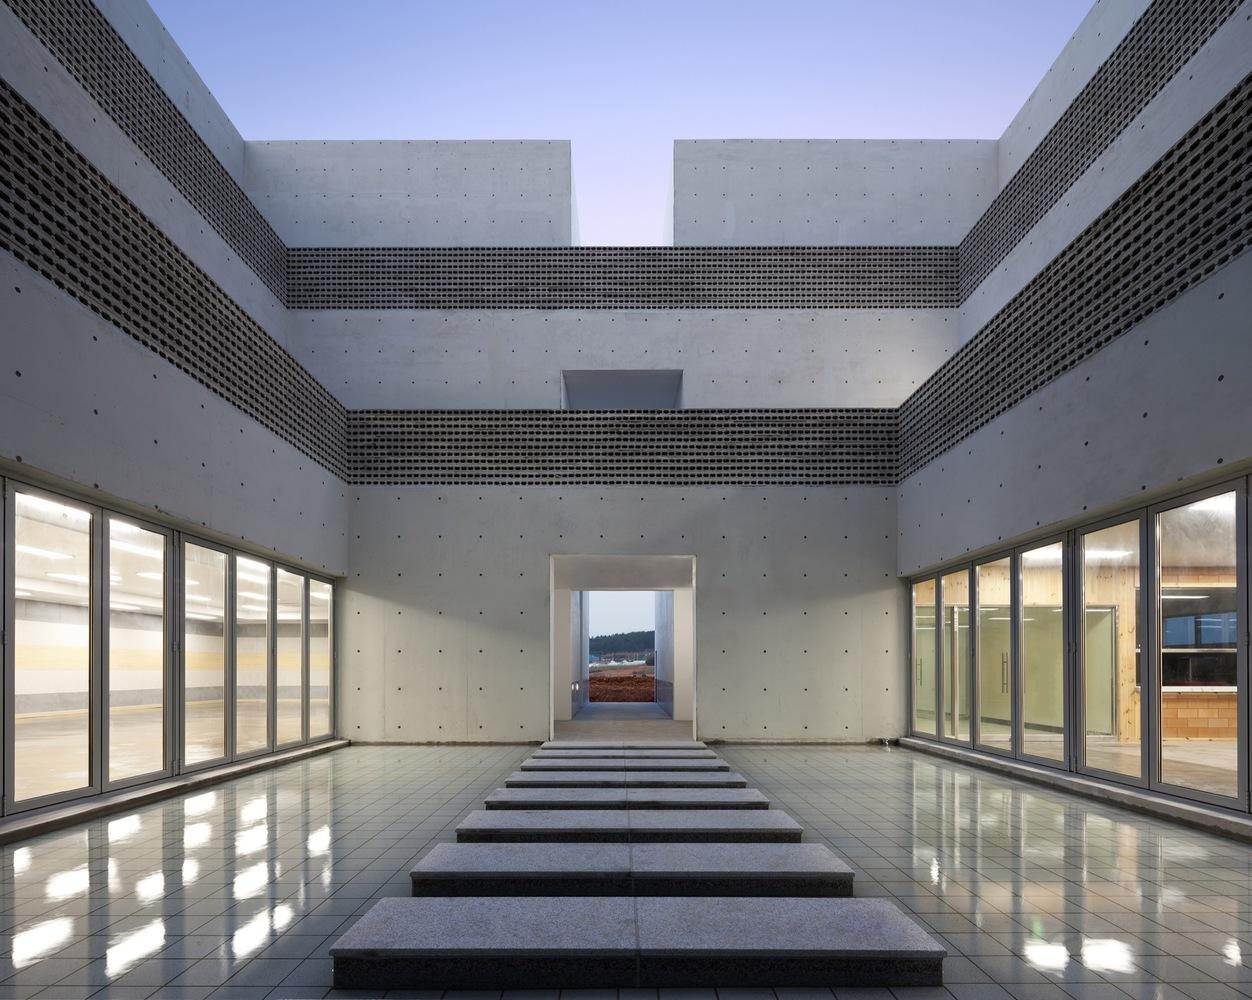 2_The Void_Hyunjoon Yoo Architects_Inspirationist